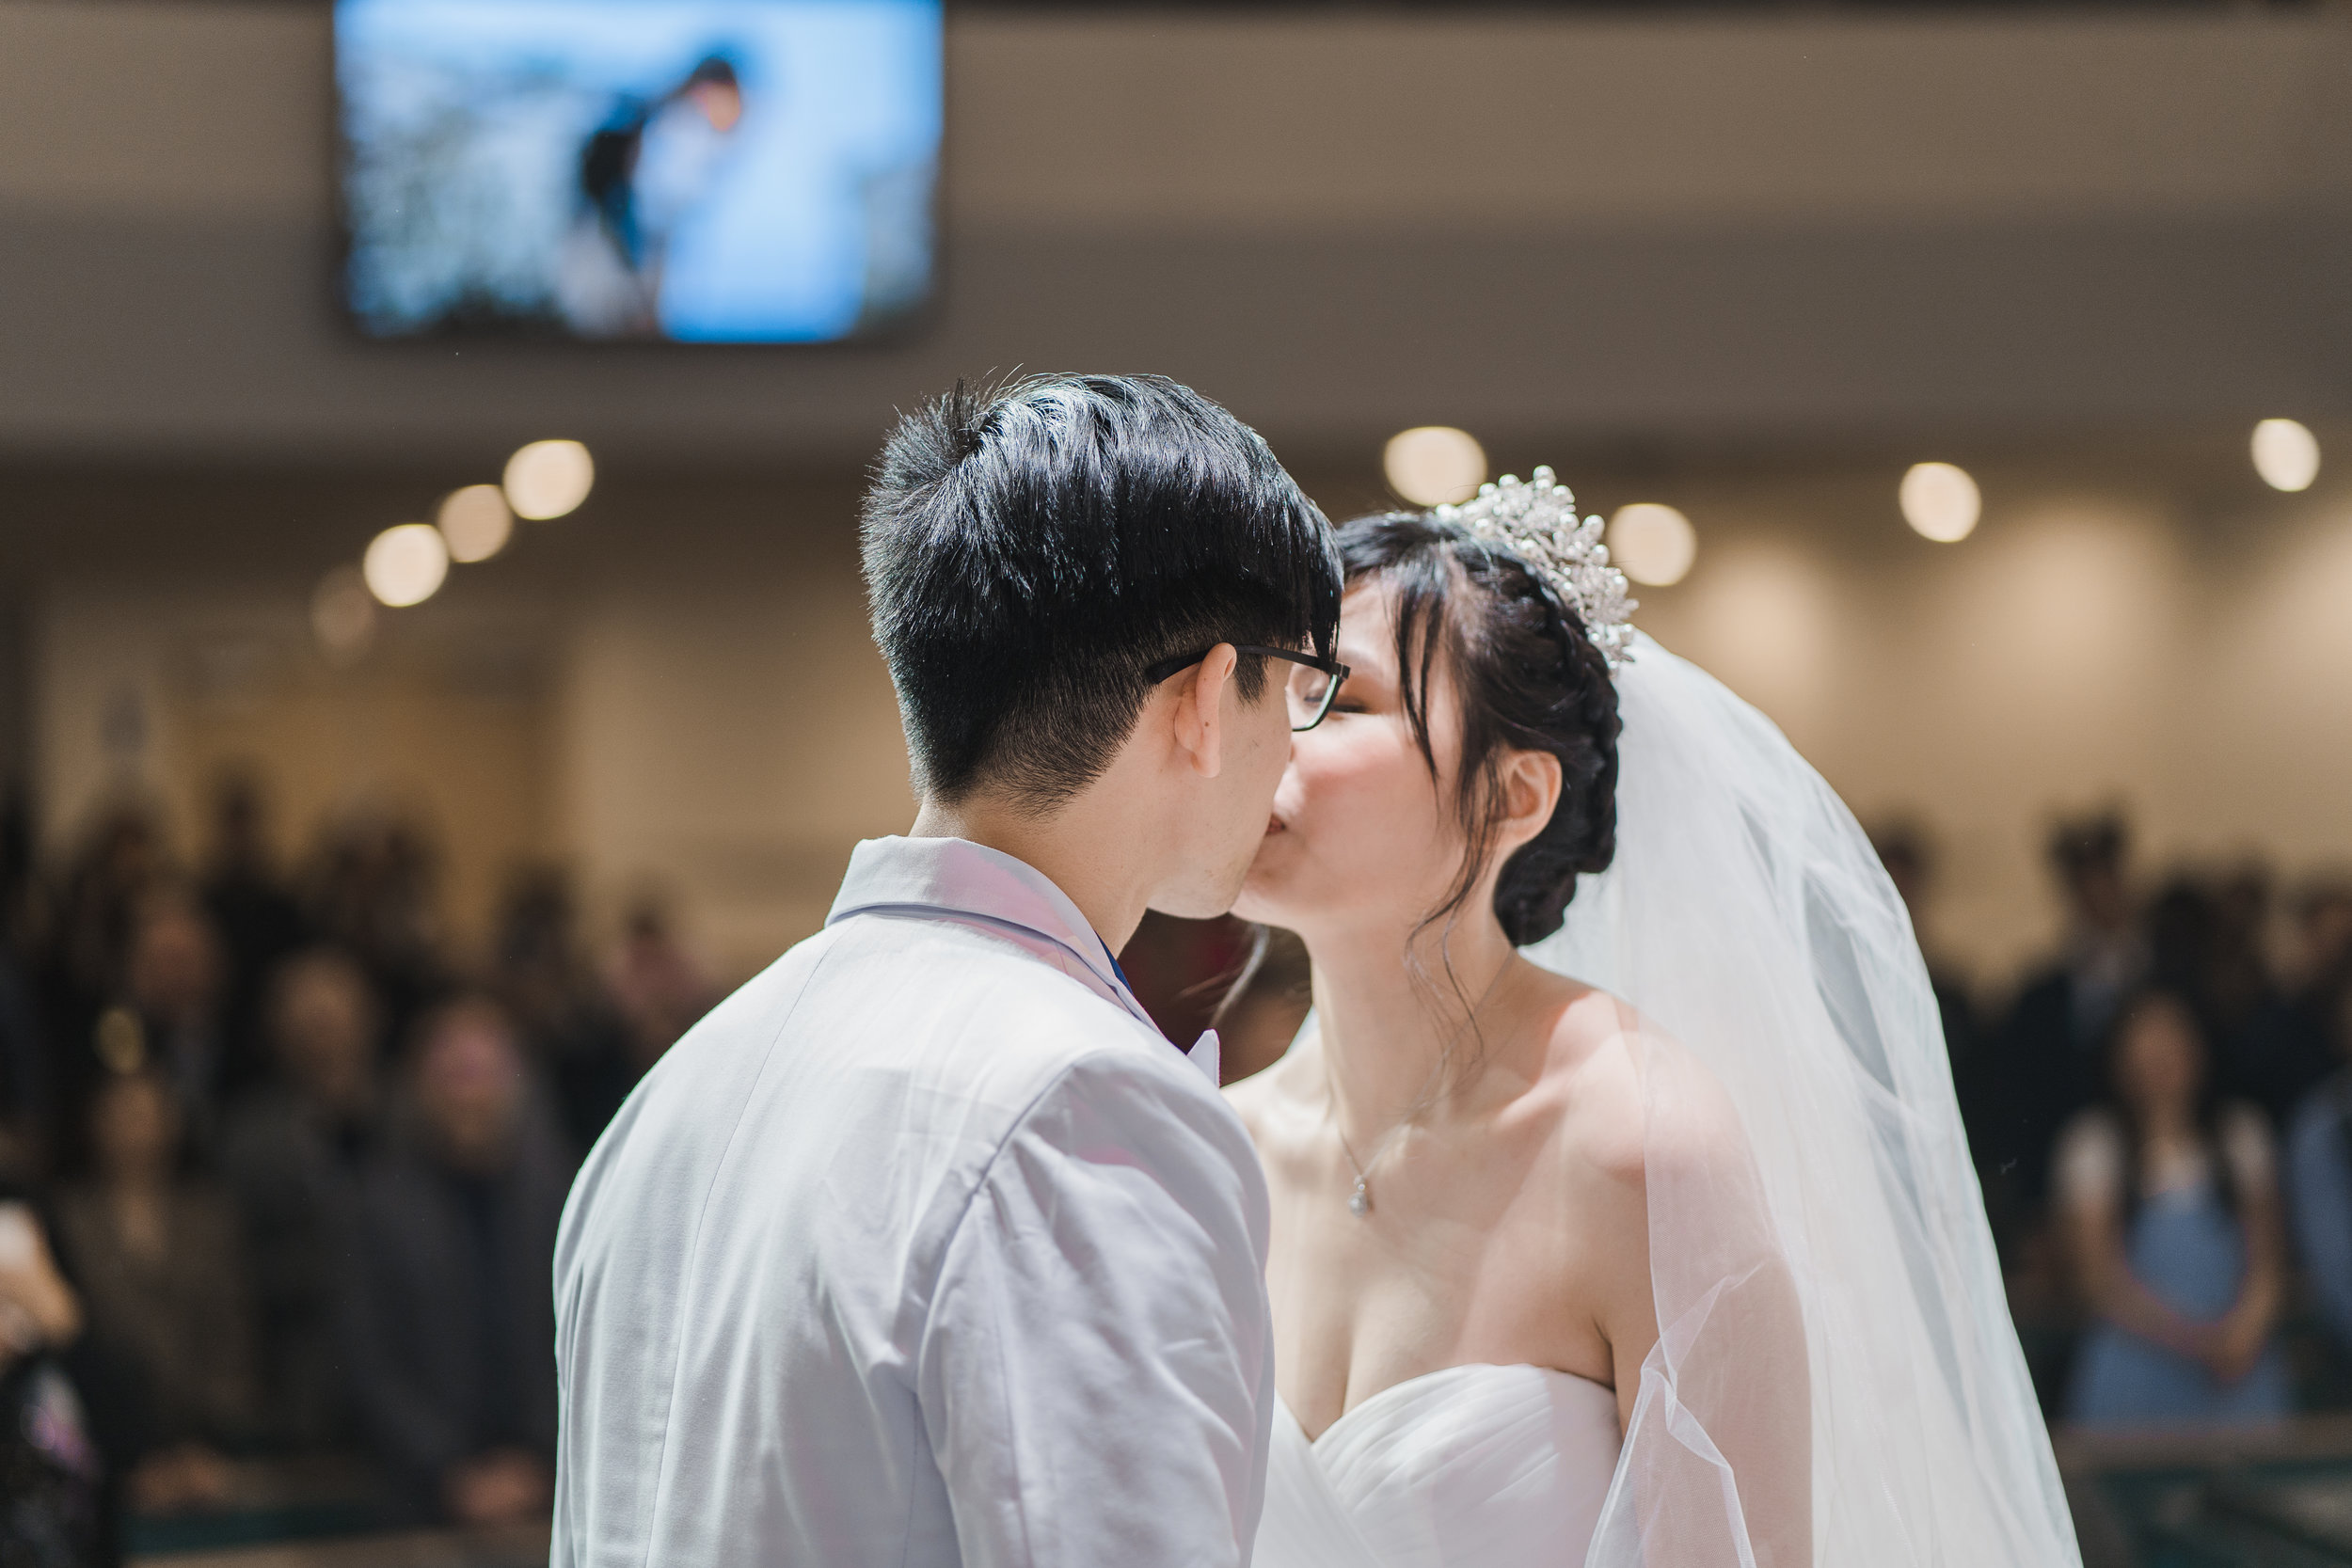 20190520 - Pamela & Matthew Wedding - 0161.jpg